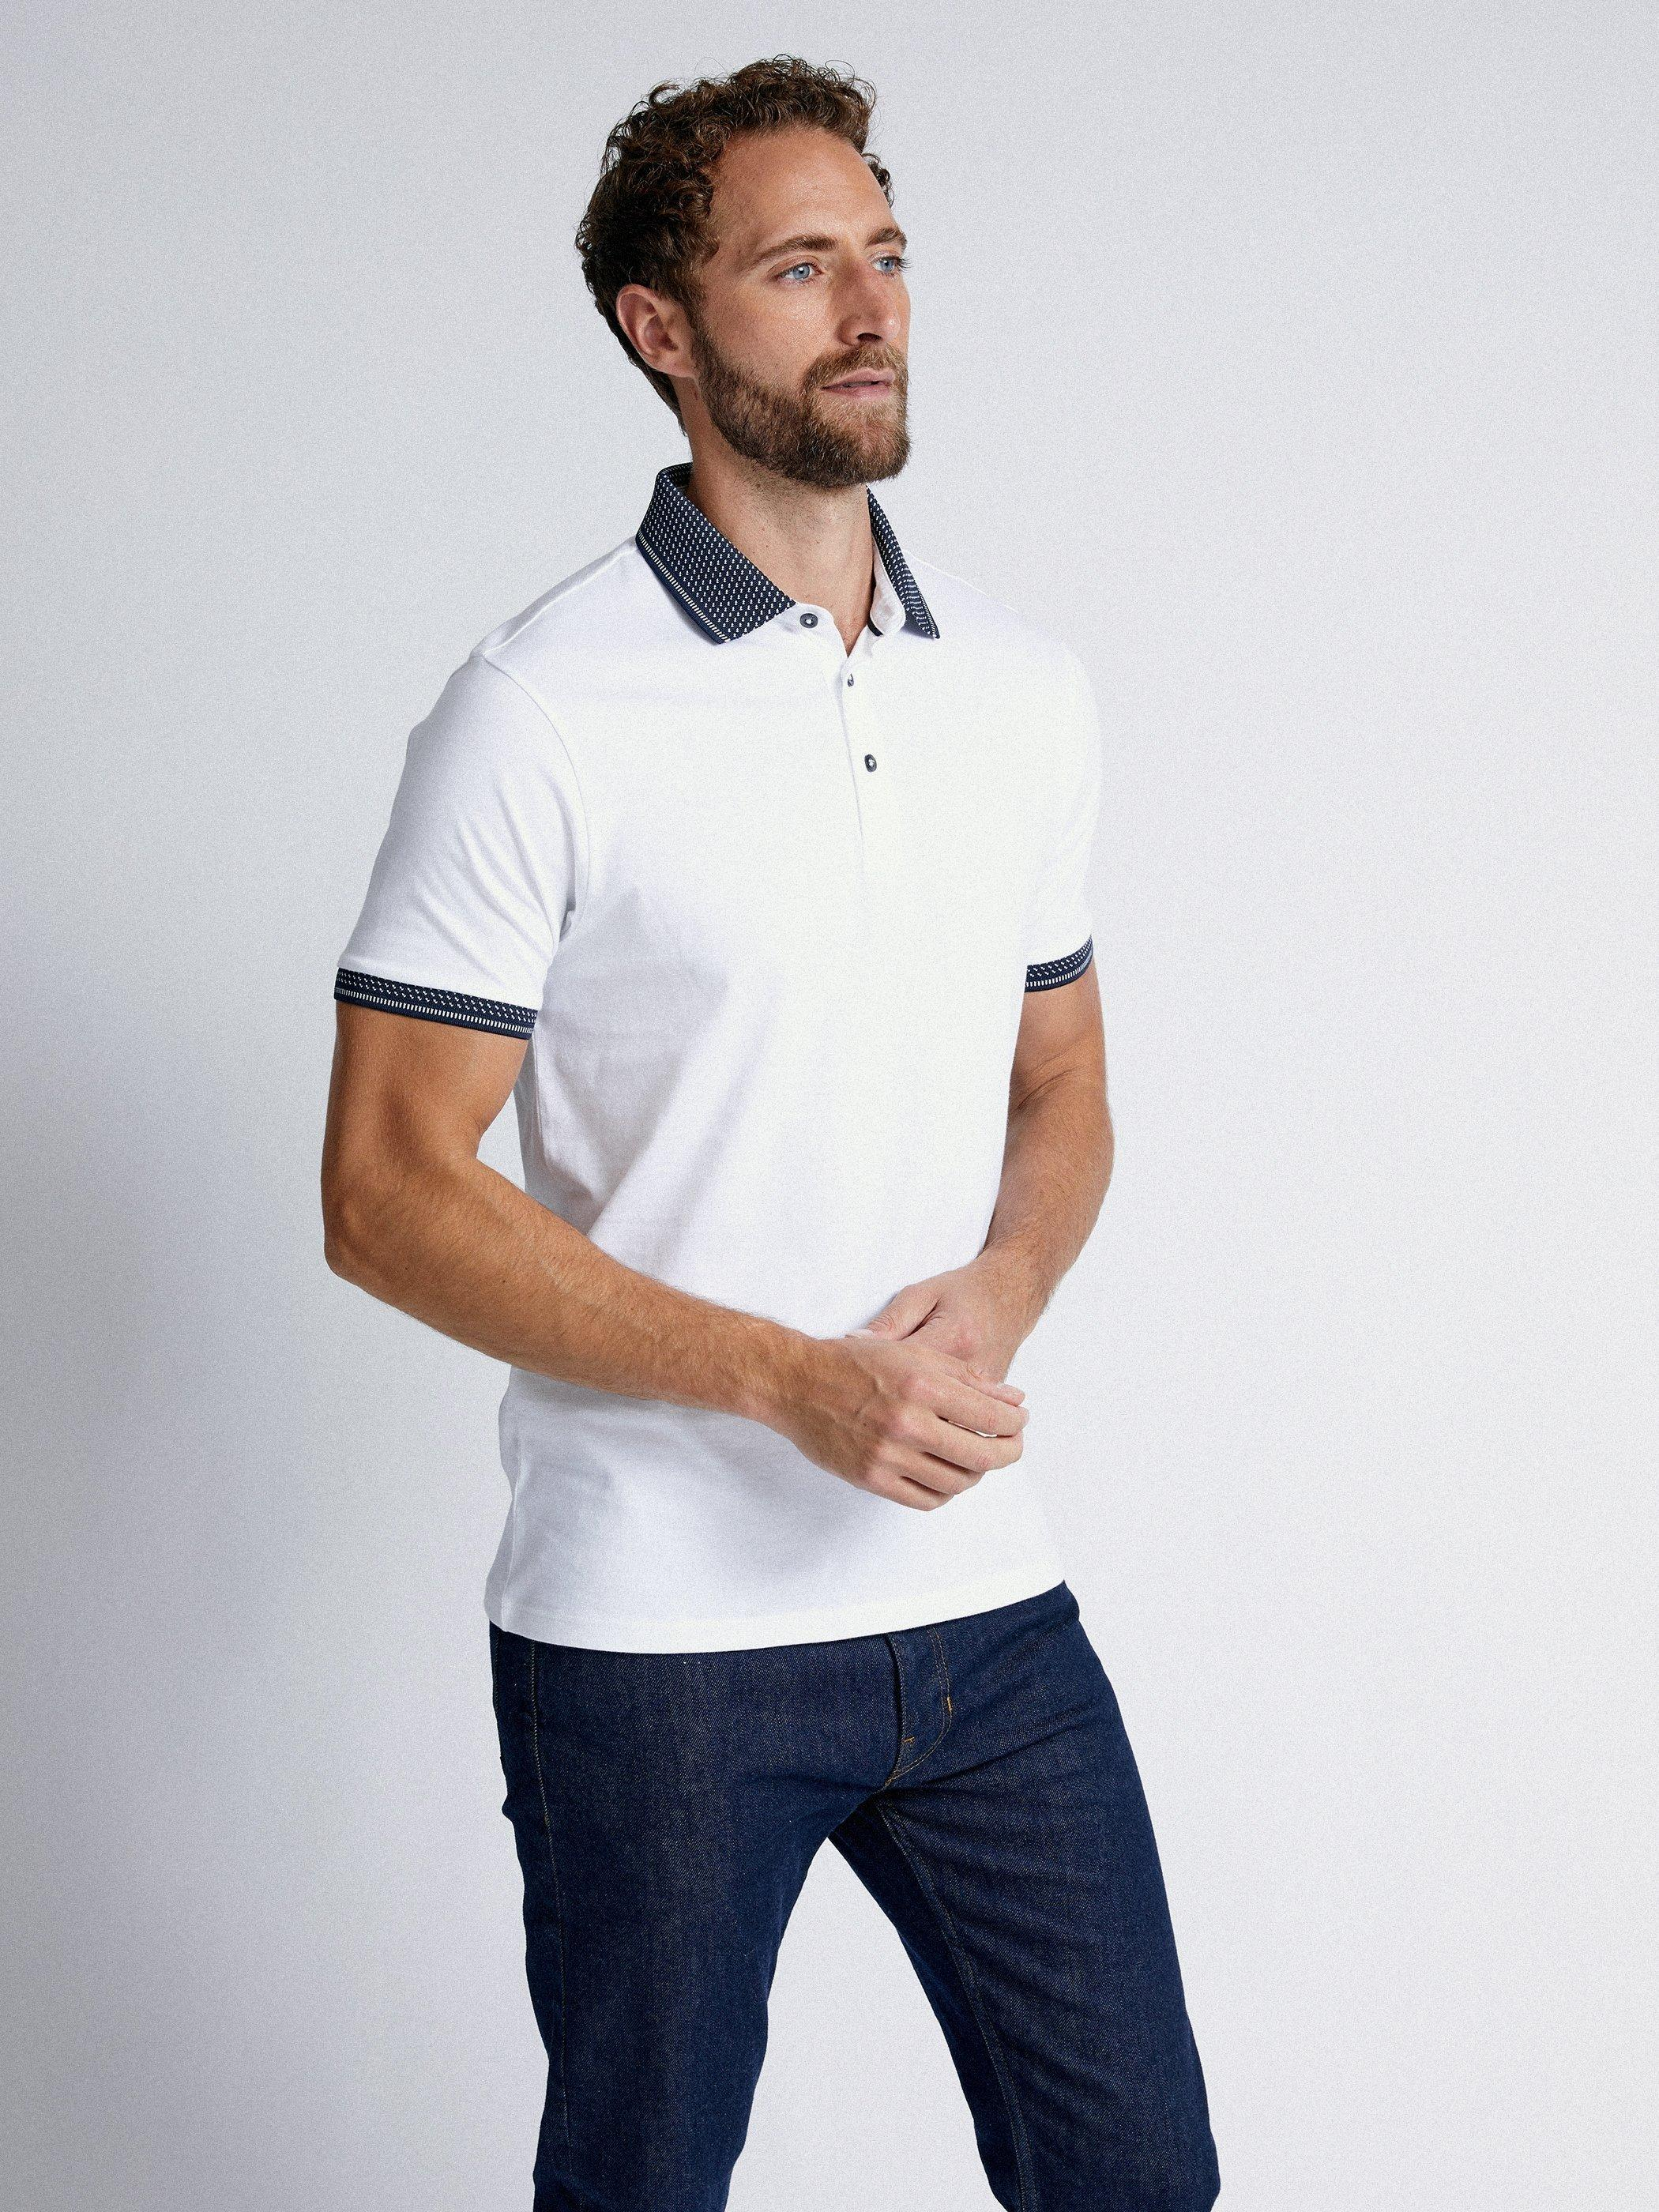 Men'S White Jacquard Collar Polo Shirt - S